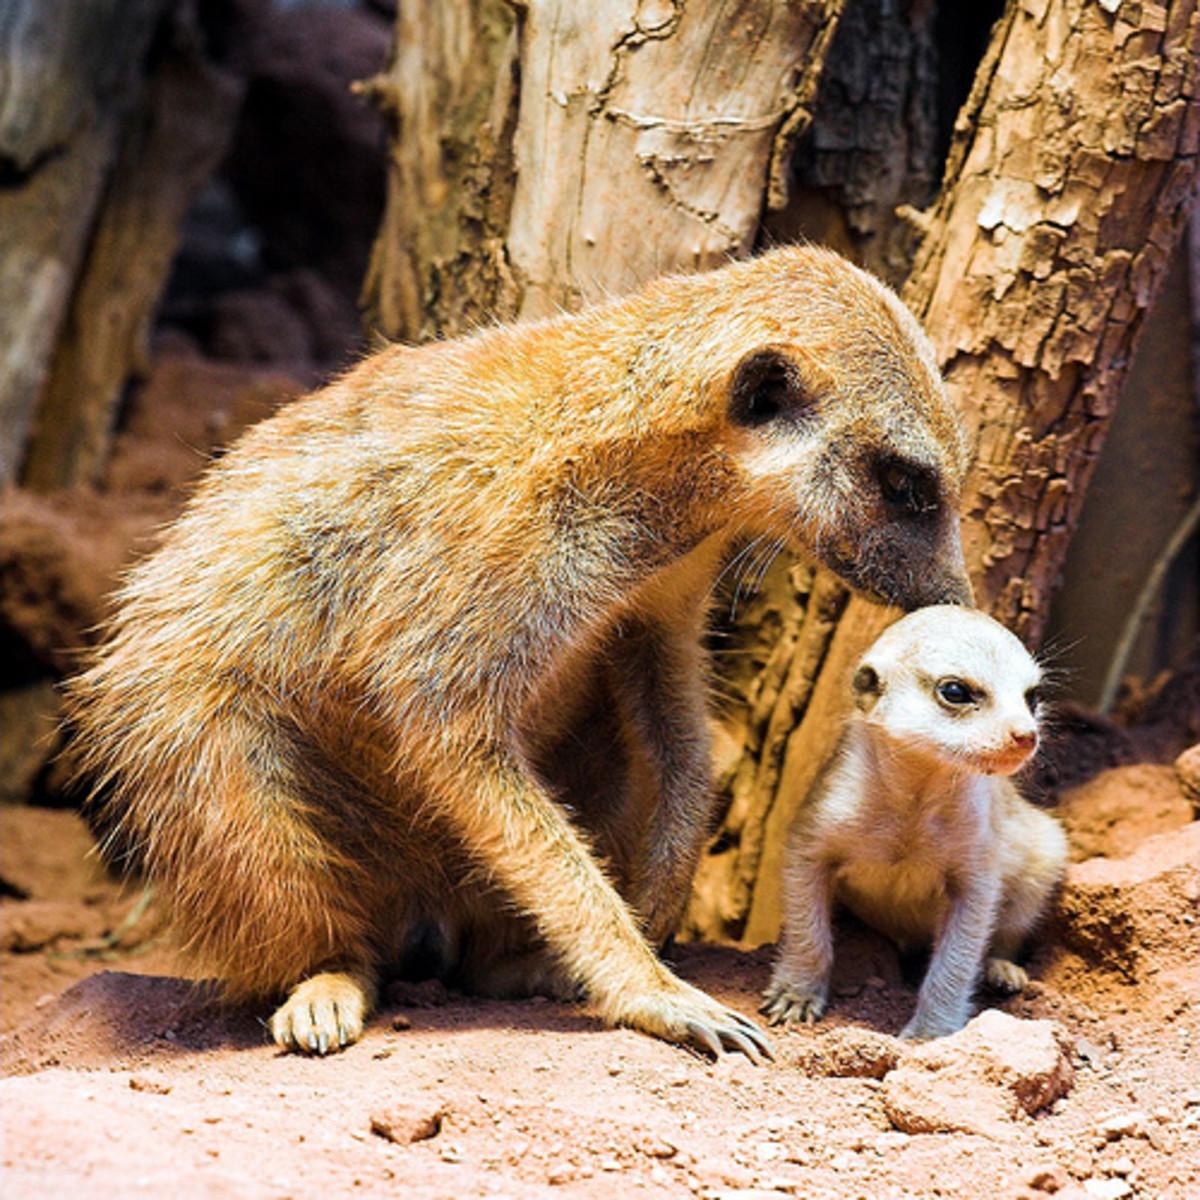 Zoos and Euthanasia